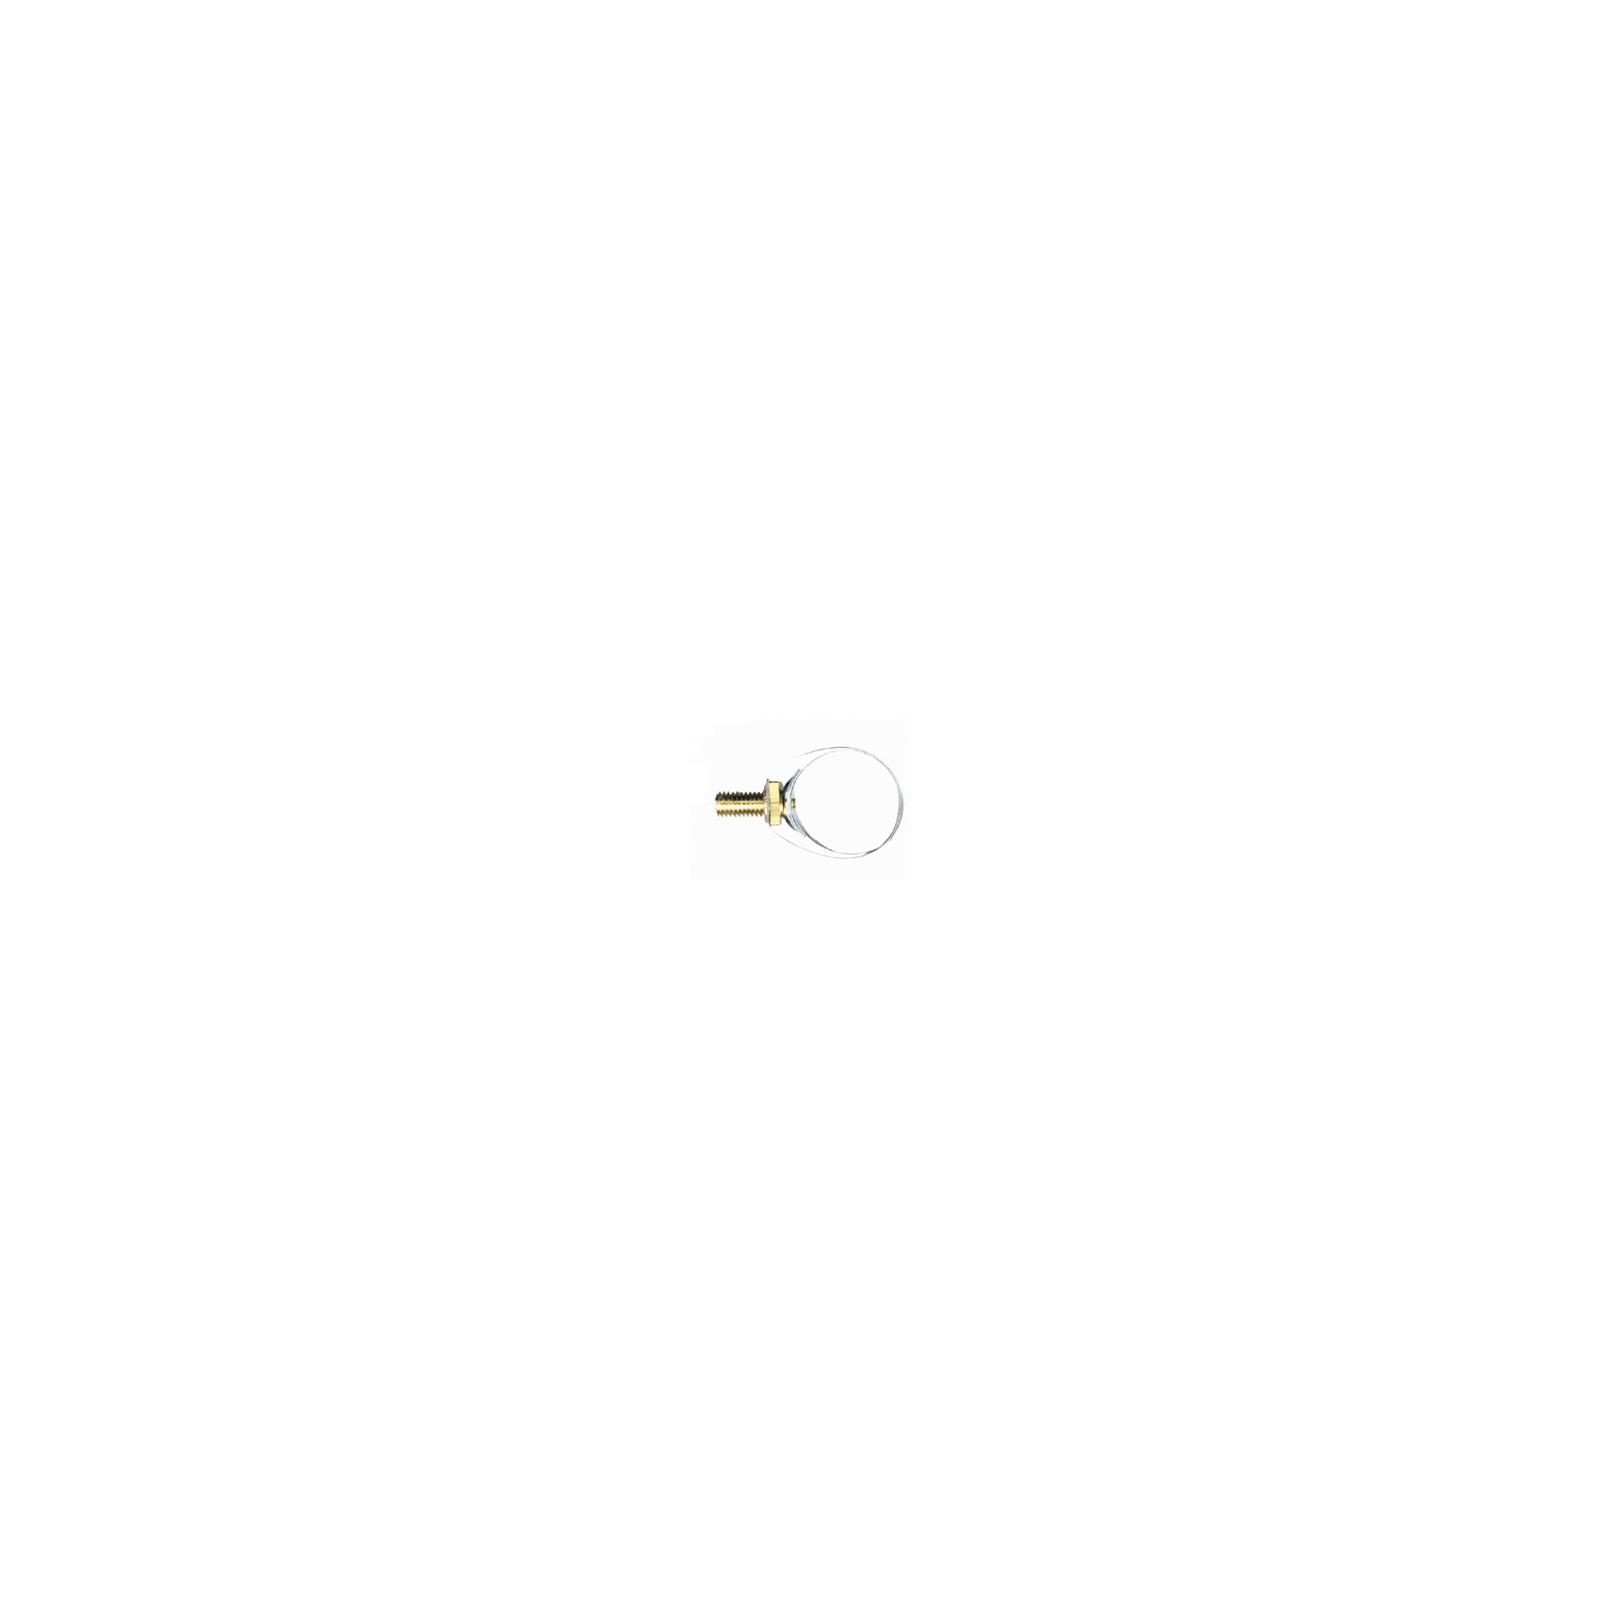 Eheim svorka na hadici 12/16 mm